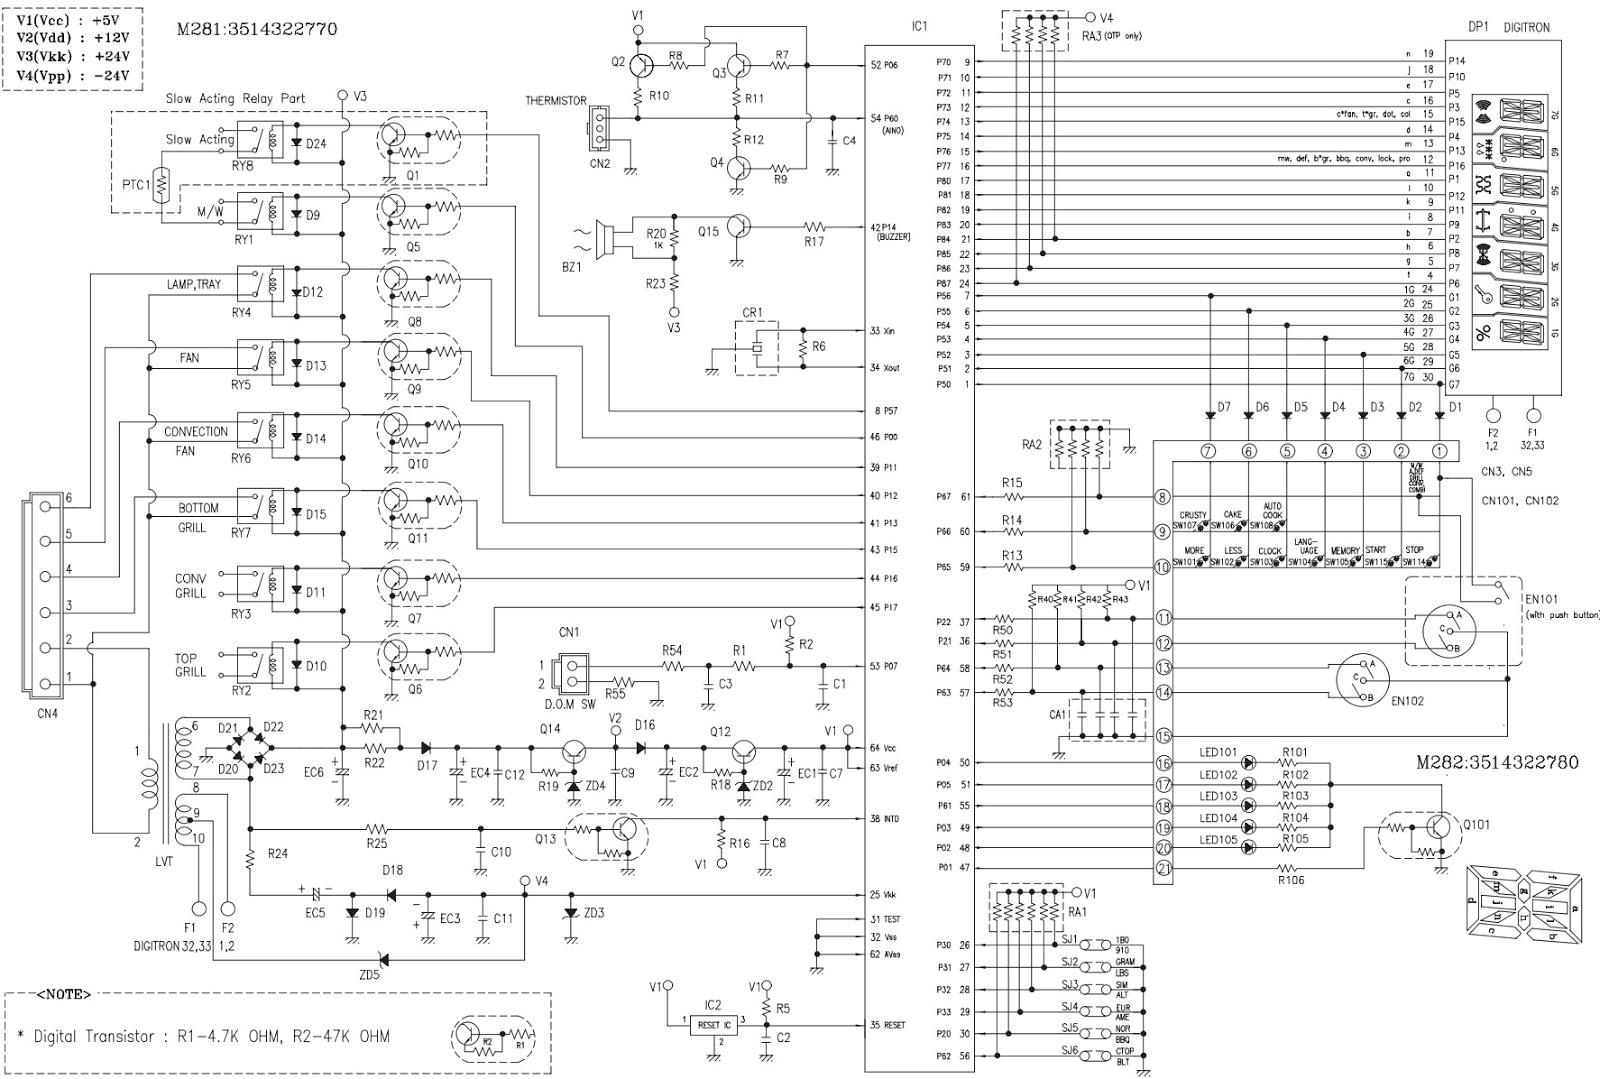 Daewoo Lanos Wiring Diagram Basic Ignition System 2000 Stereo Scion Xa